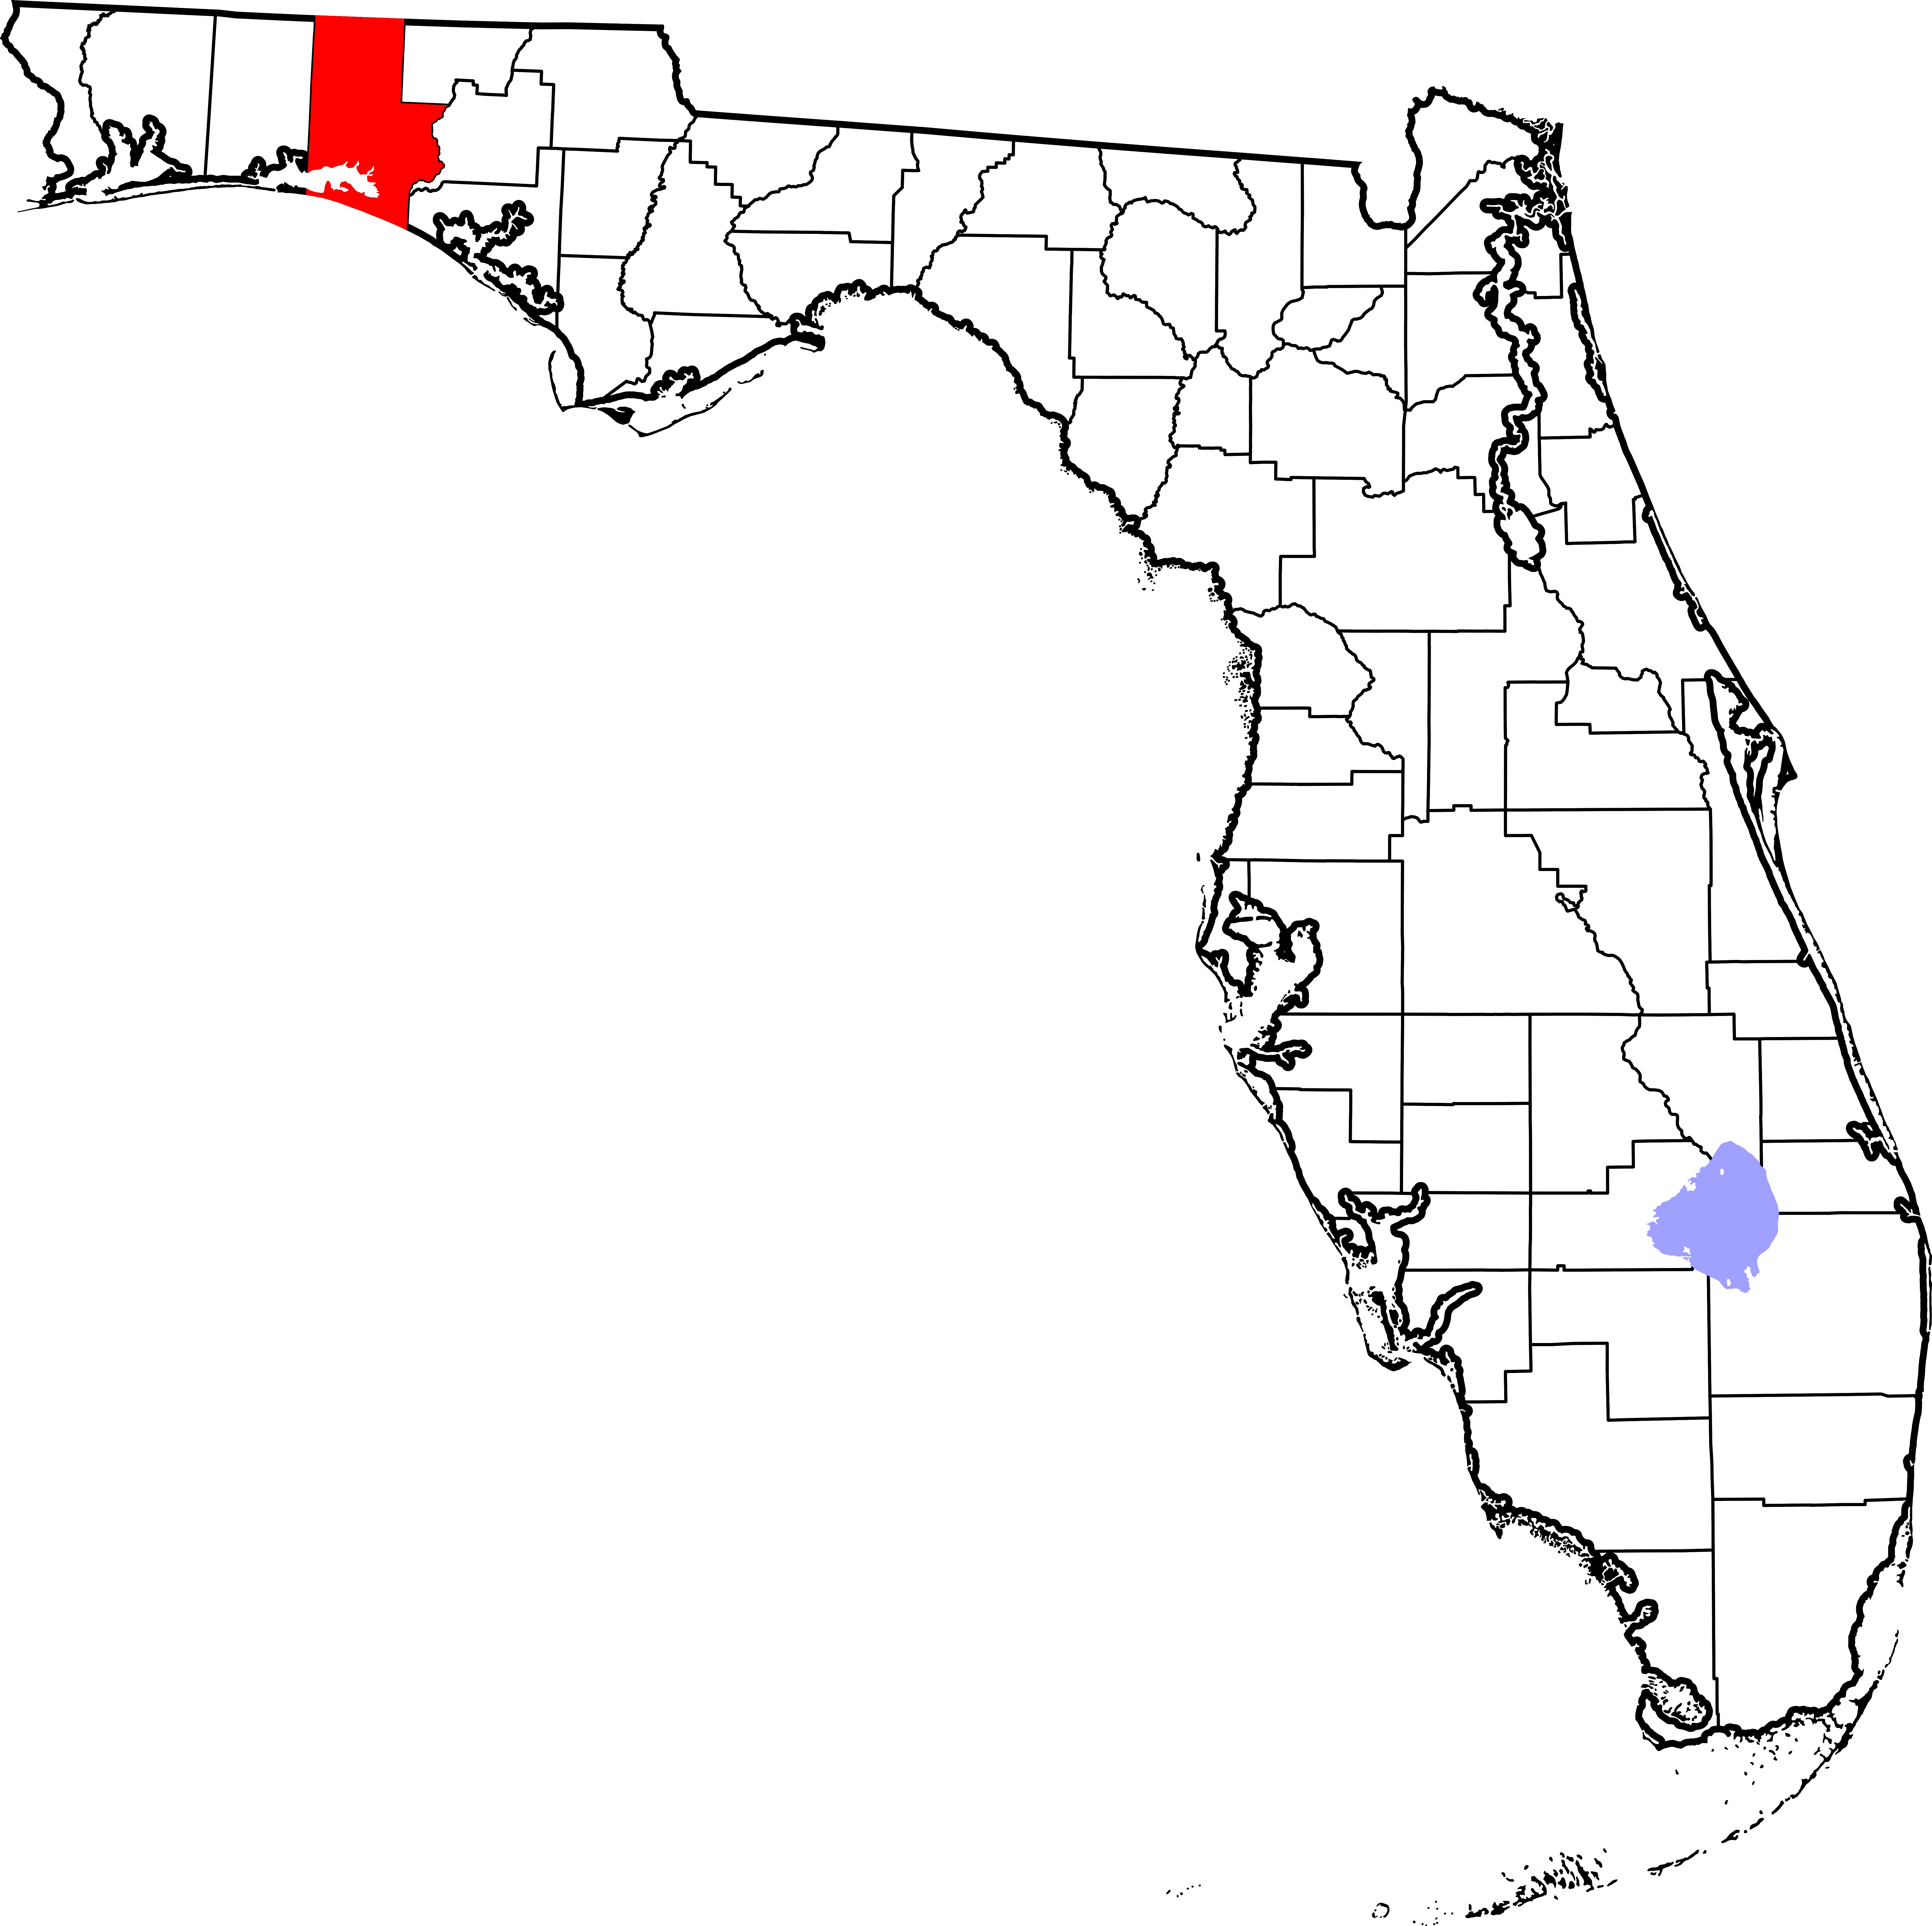 Seaside Florida Map.Seaside Florida Worlds Best Beach Towns